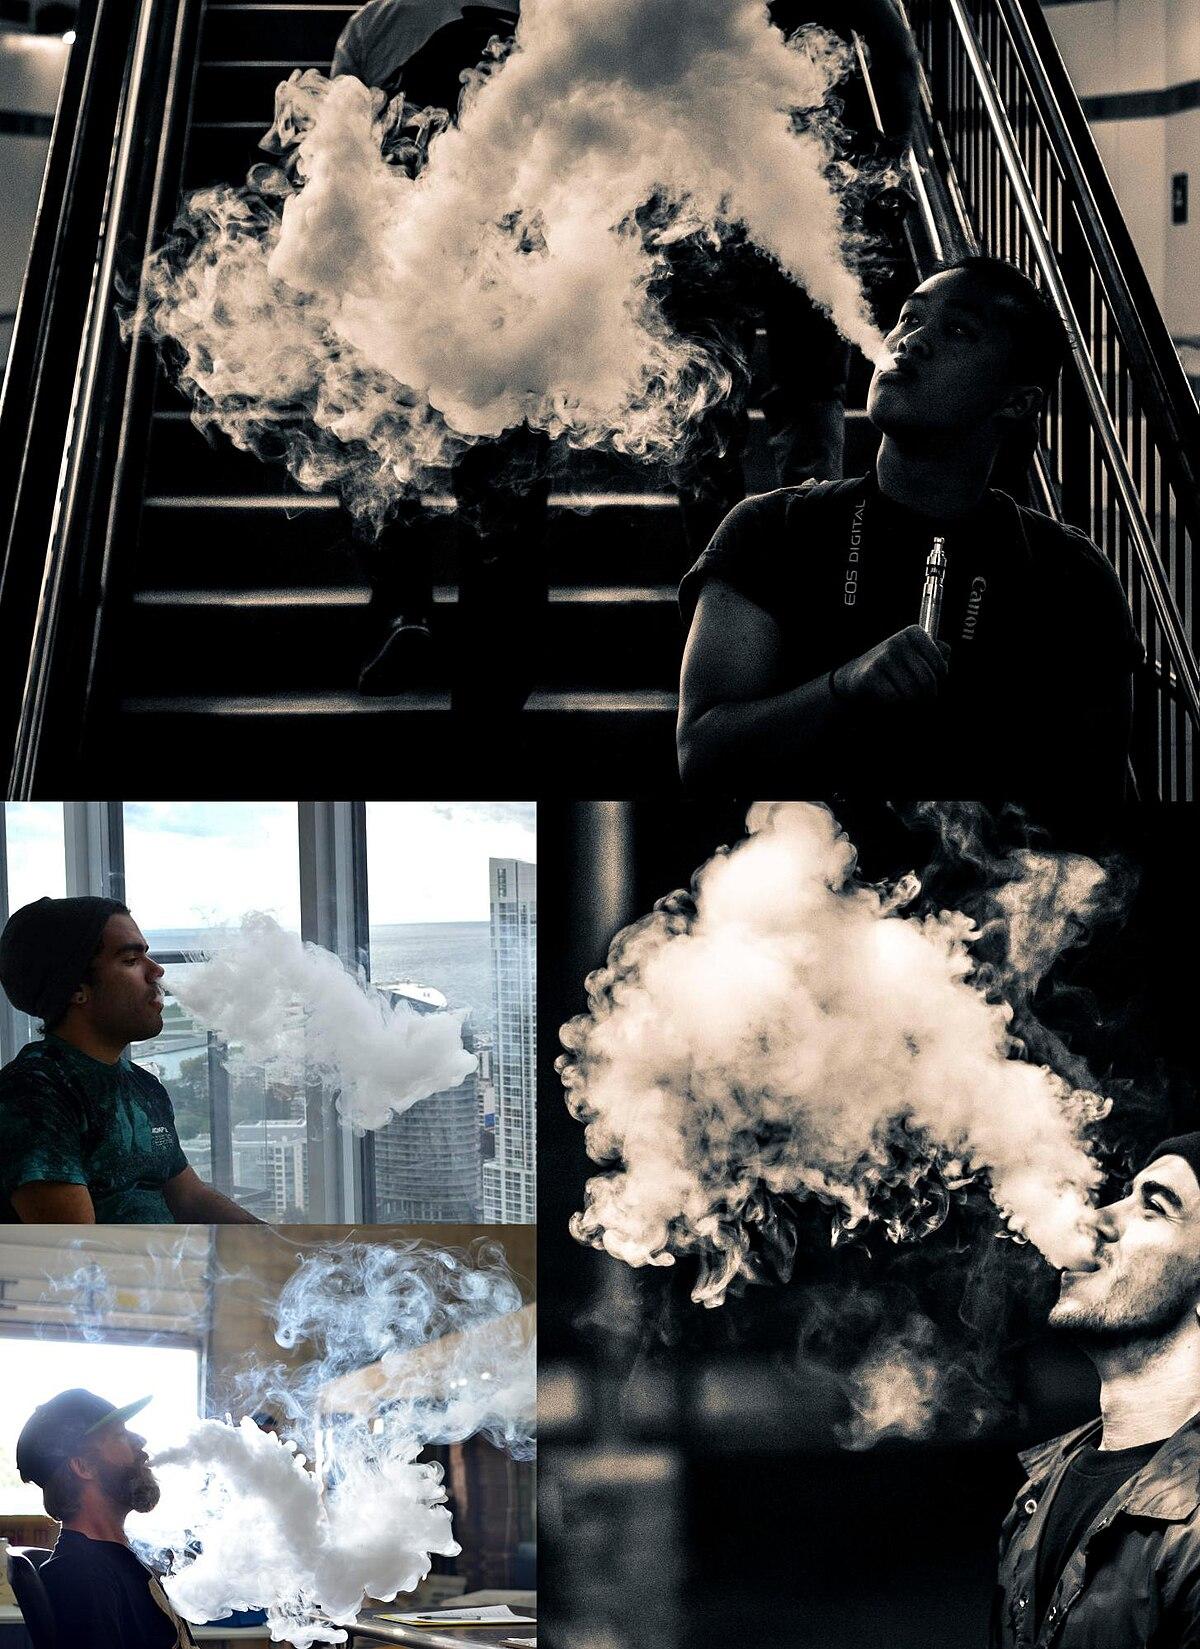 Cloud-chasing (electronic cigarette) - Wikipedia